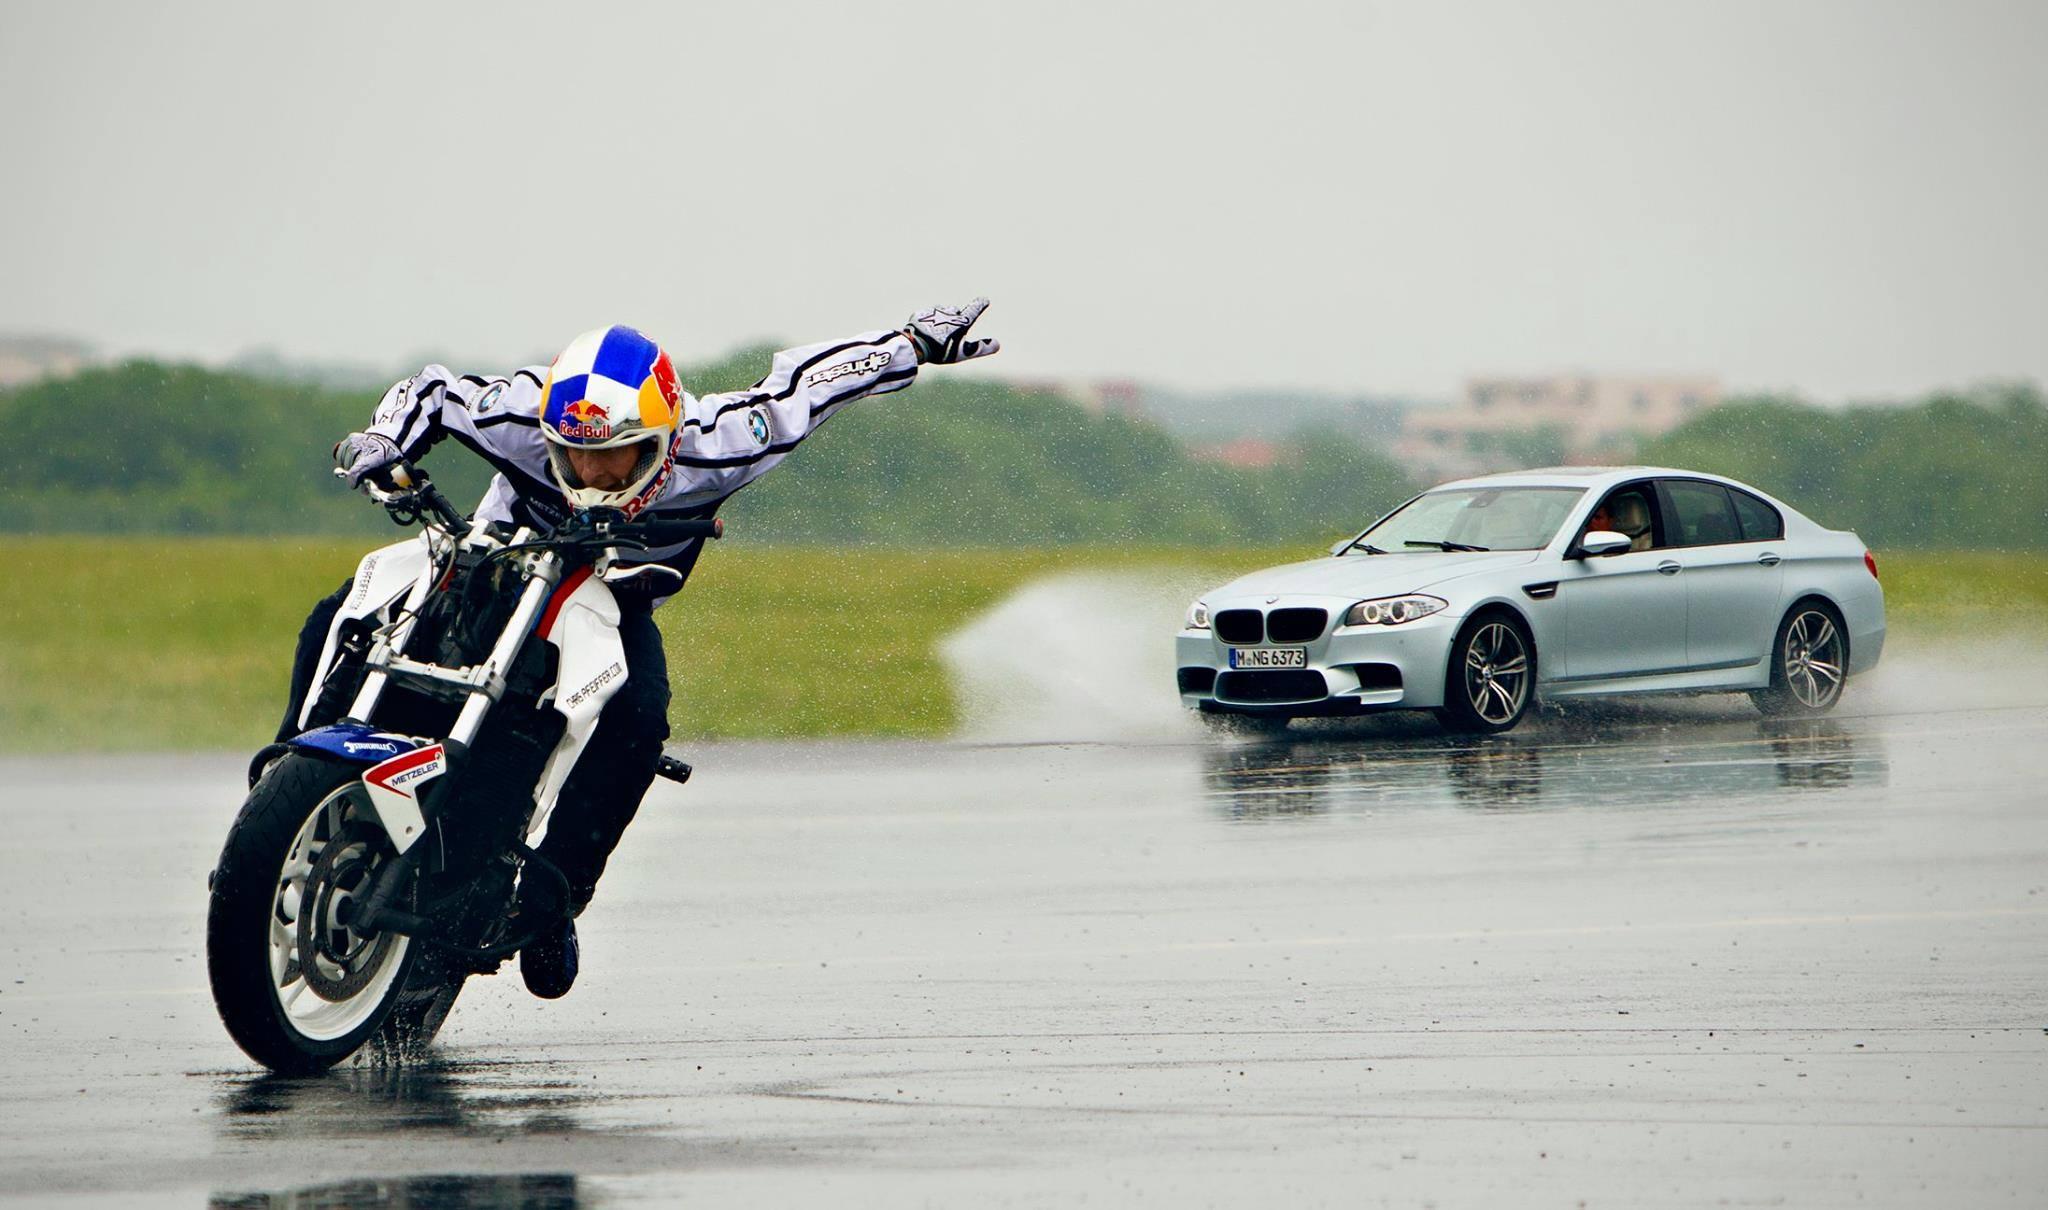 Legendary Stunt Rider Chris Pfeiffer Retires at 45 - autoevolution